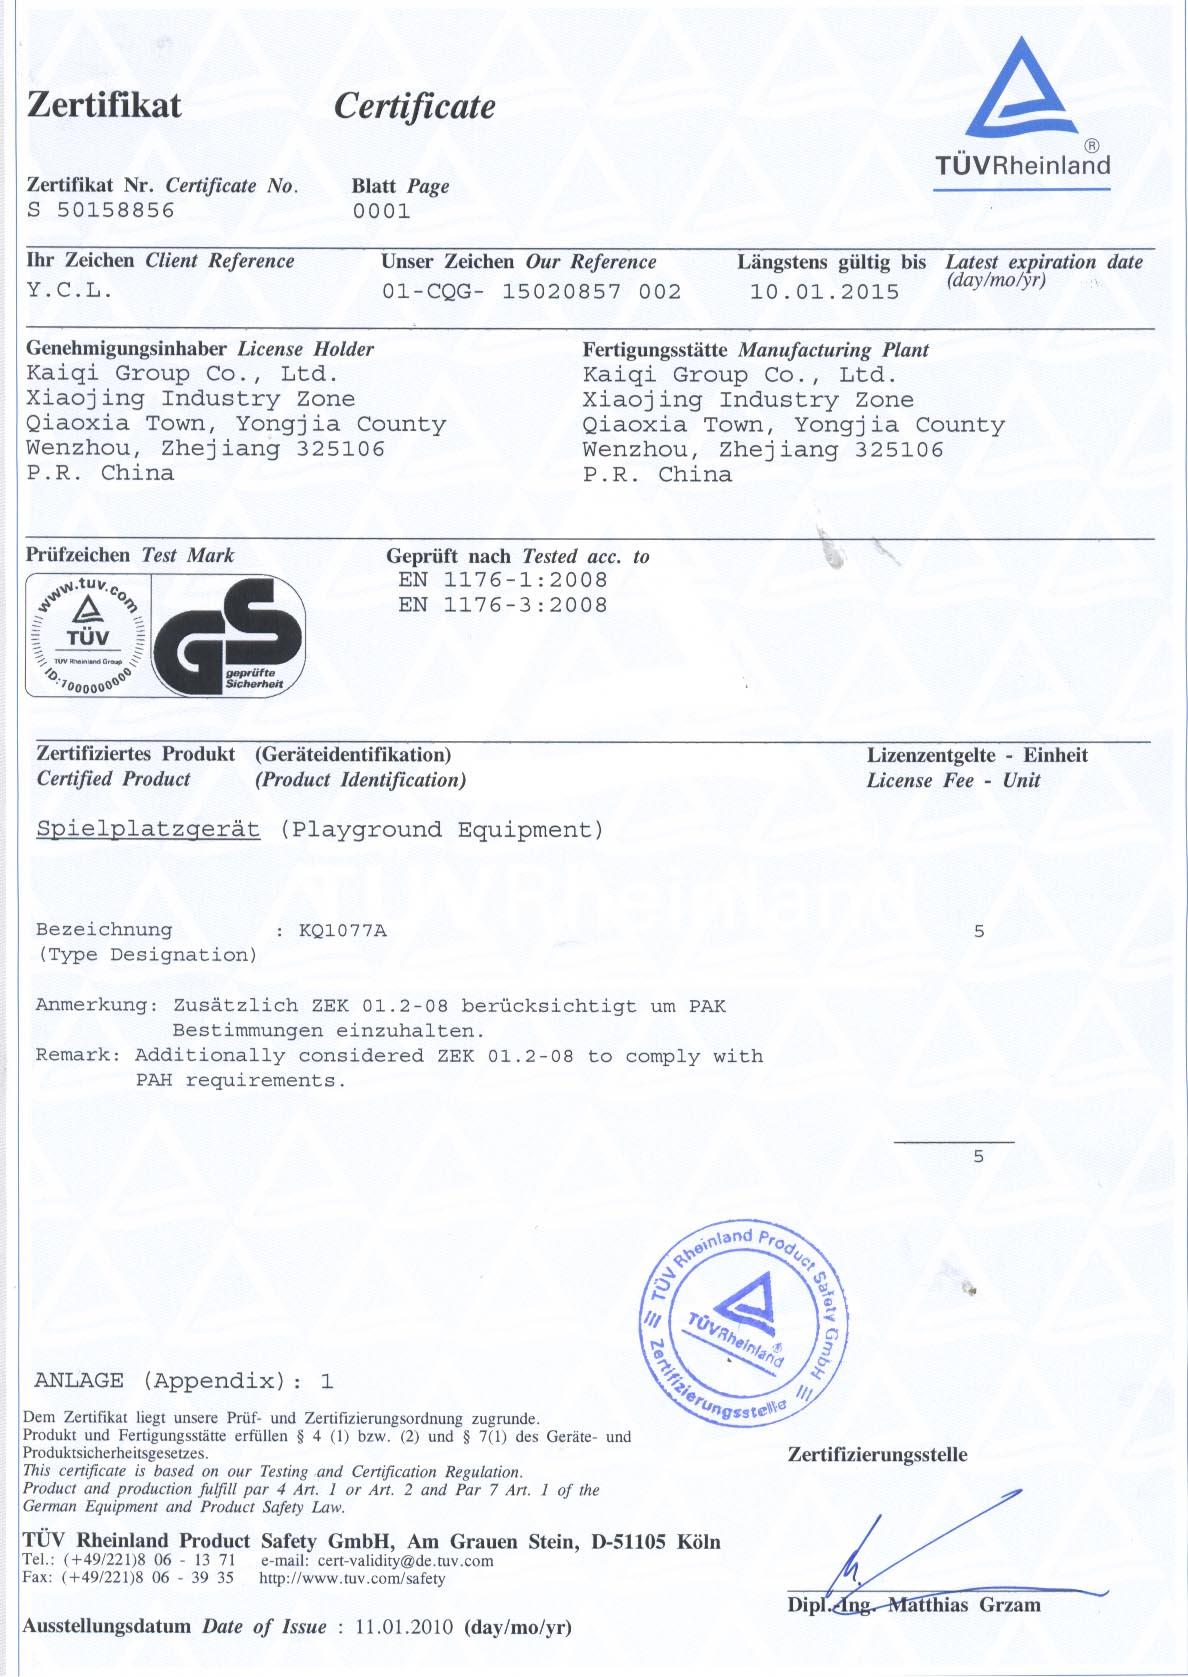 EN1176 certificate